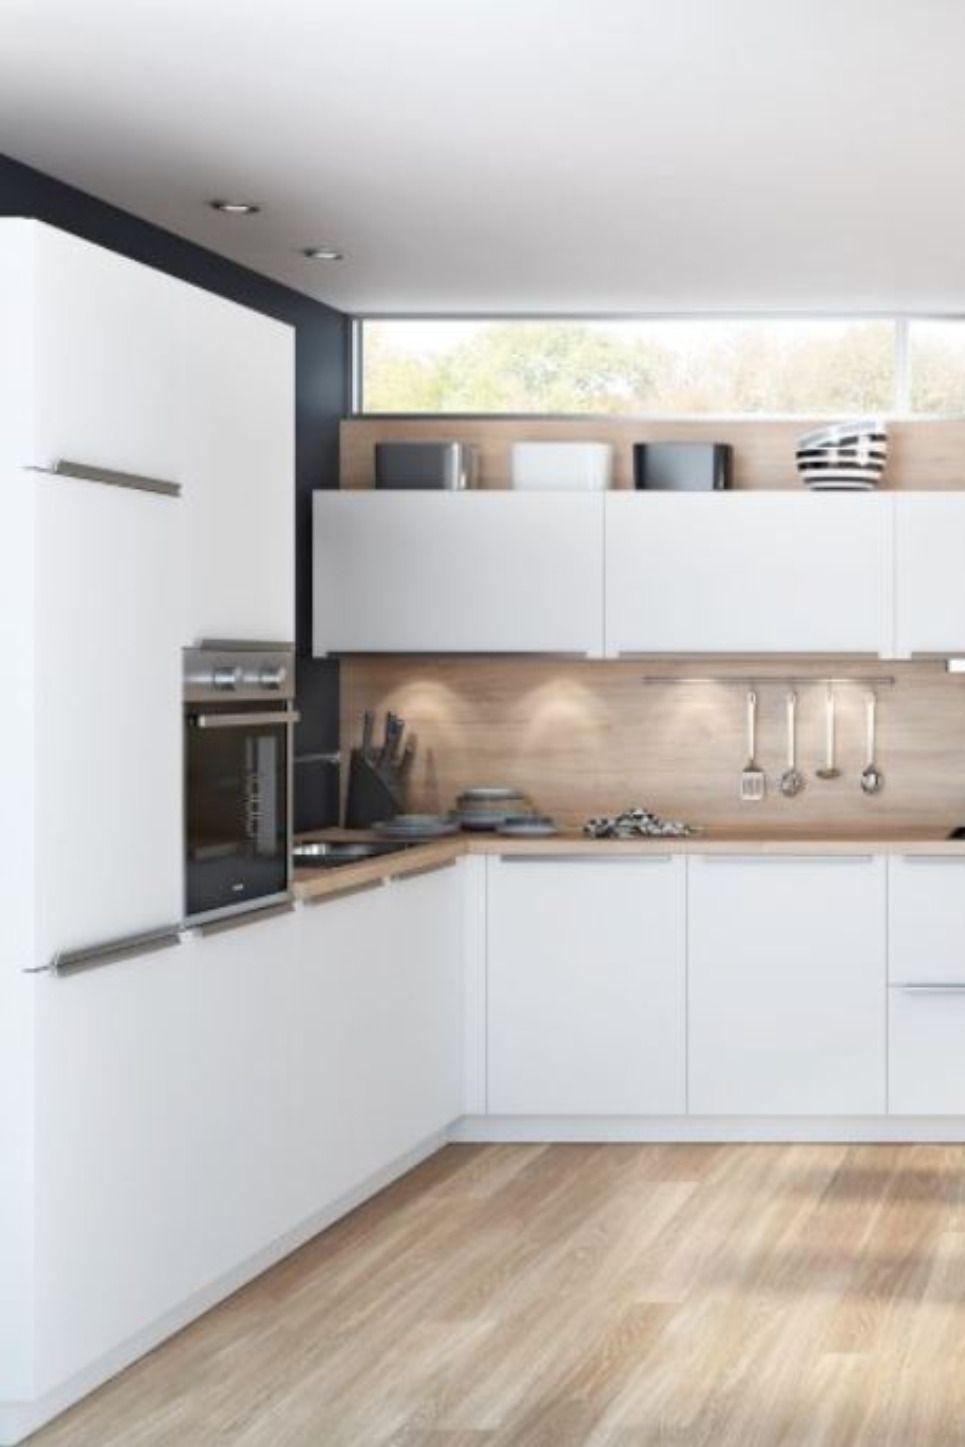 Moderne Familienkuche Helle Lackfronten Mit Holz Kombiniert